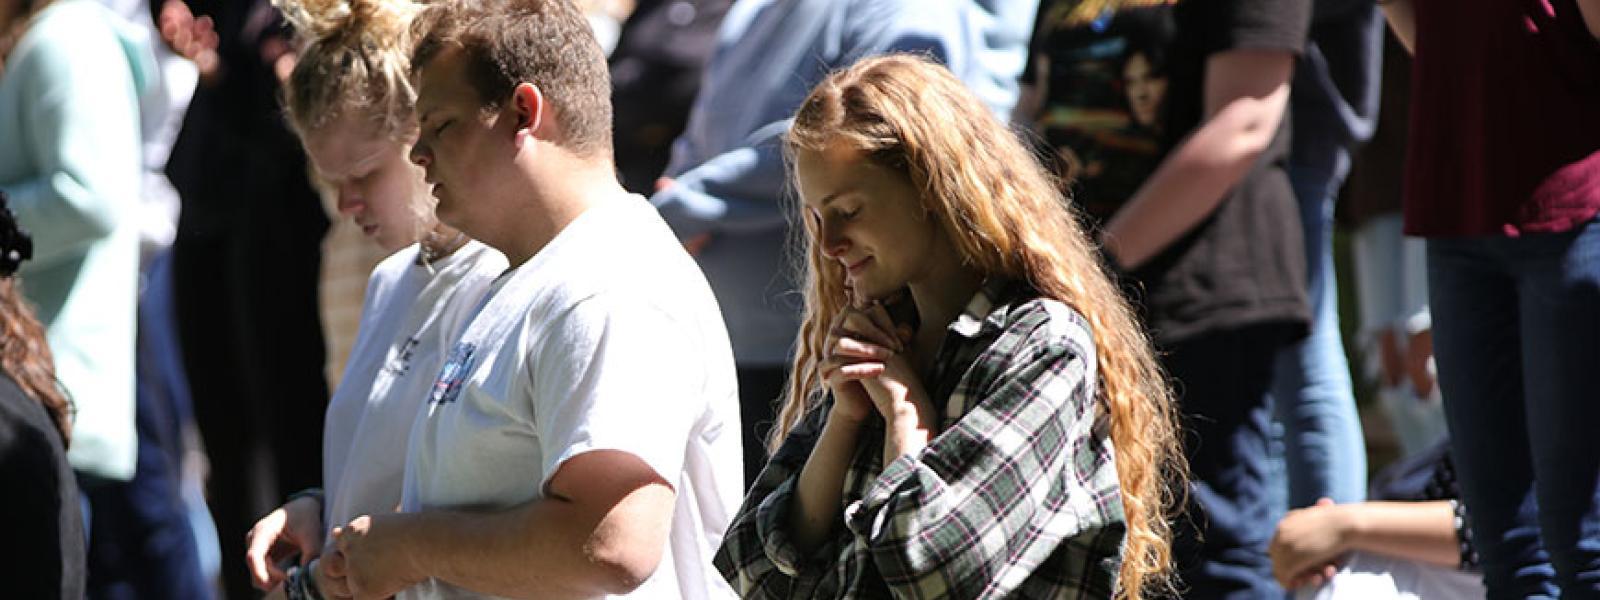 CIU students pray near the Prayer Towers.